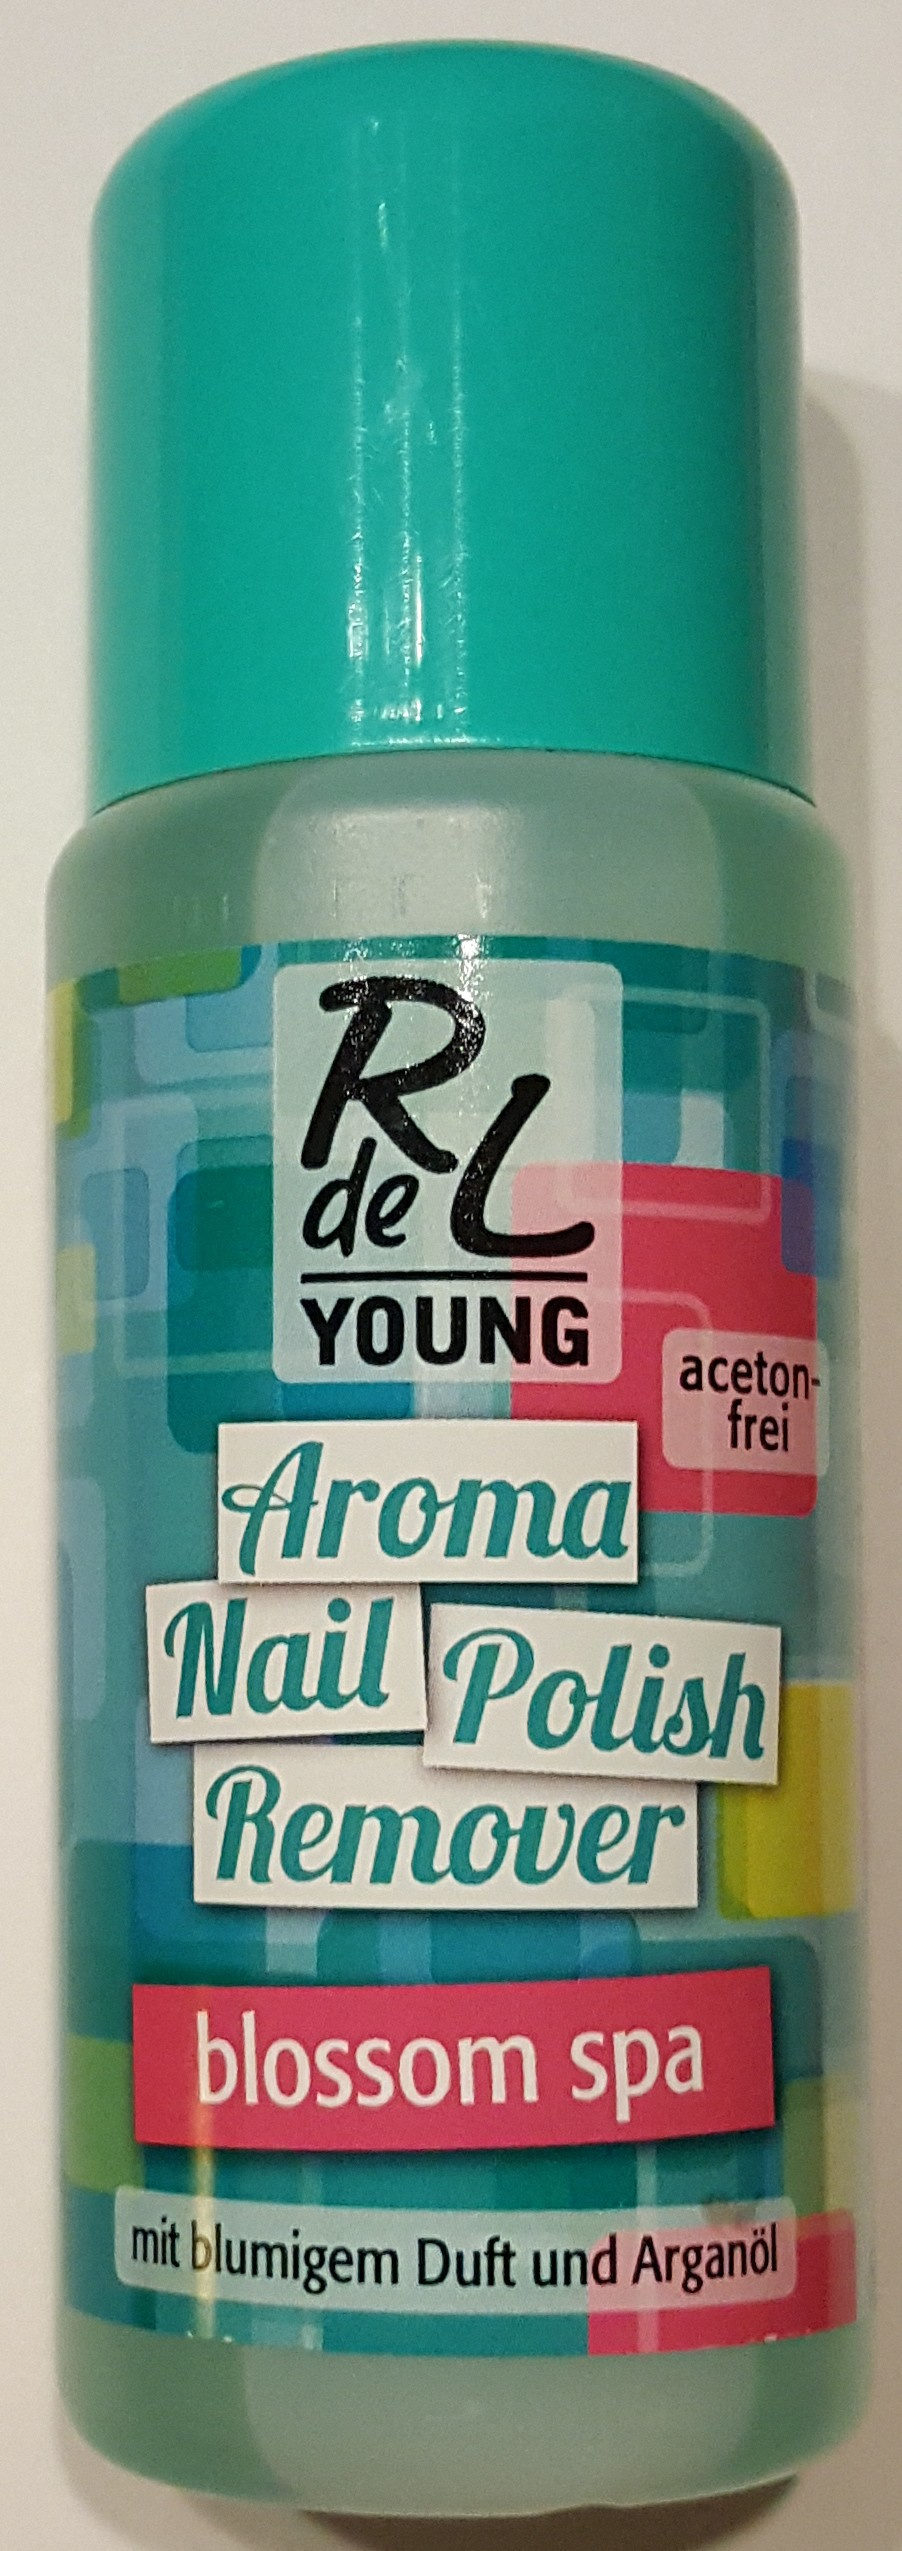 Aroma Nail Polosh Remover blossom spa - Product